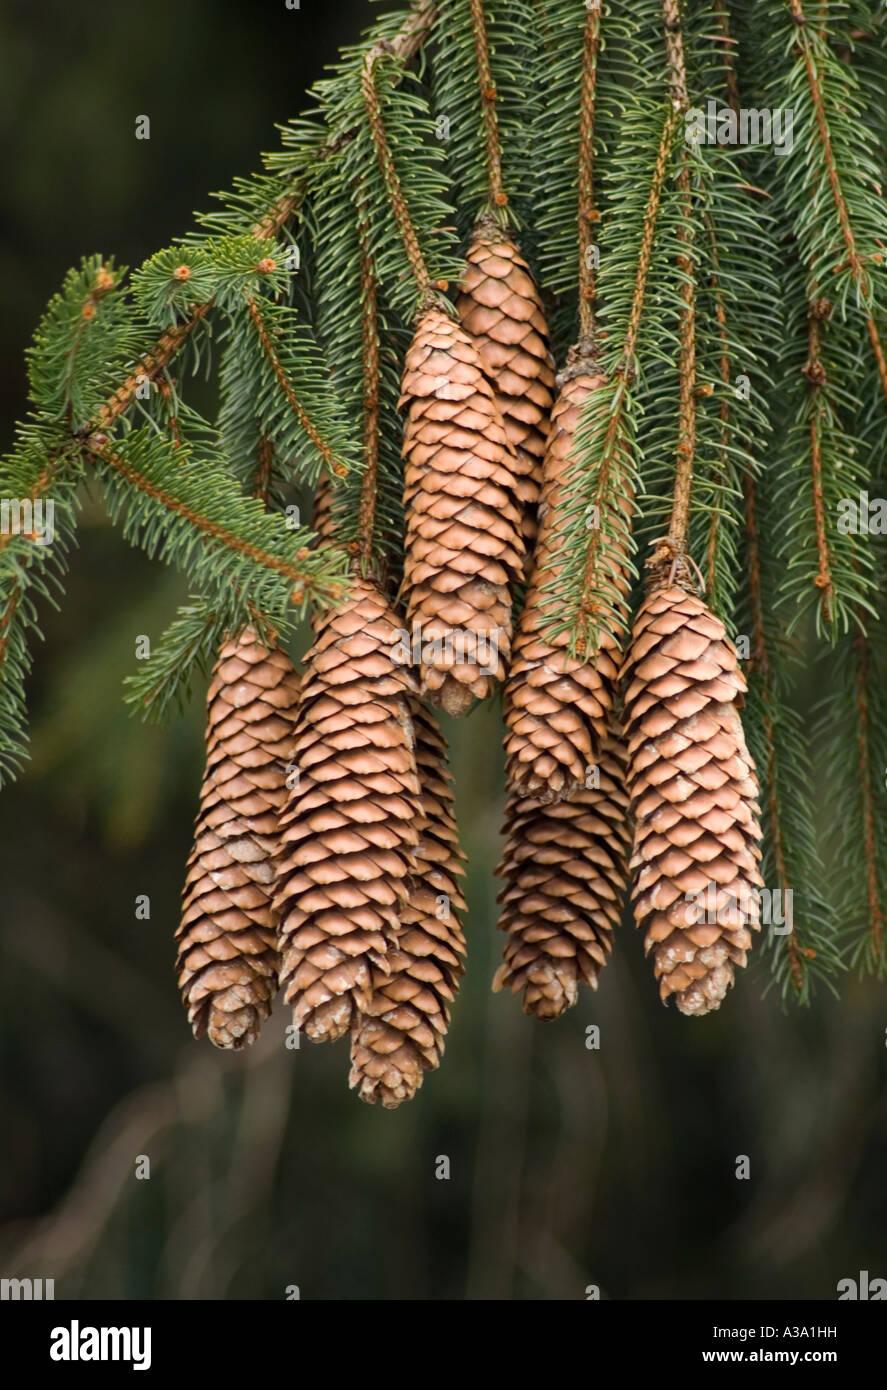 Norway Spruce Pine Cones - Stock Image